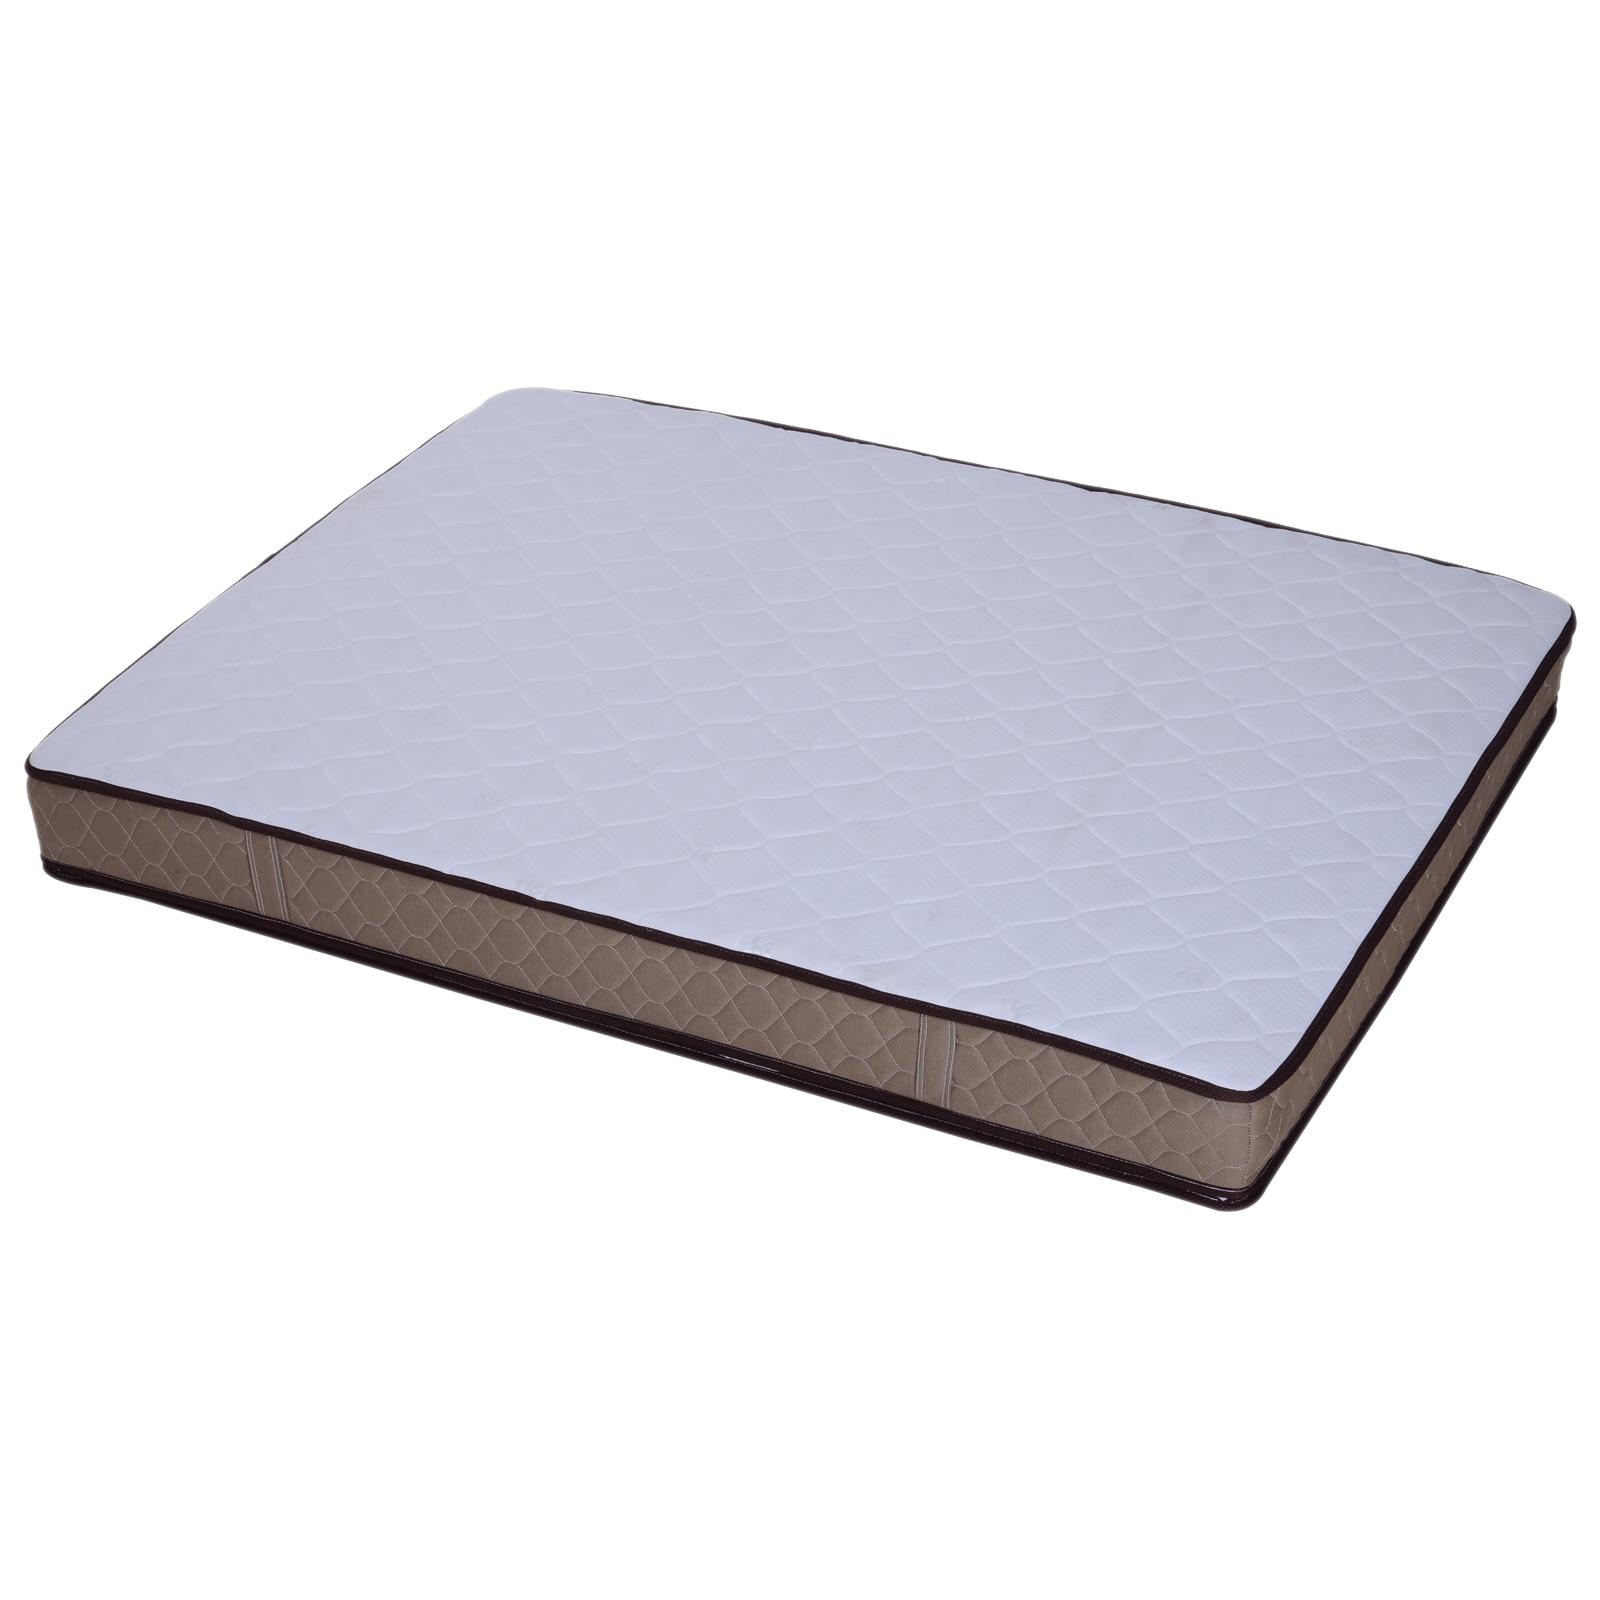 HOMCOM Quilting Mattress Bed 1 Square & half Thickness 23 cm Anti Mite 150x200x23cm White